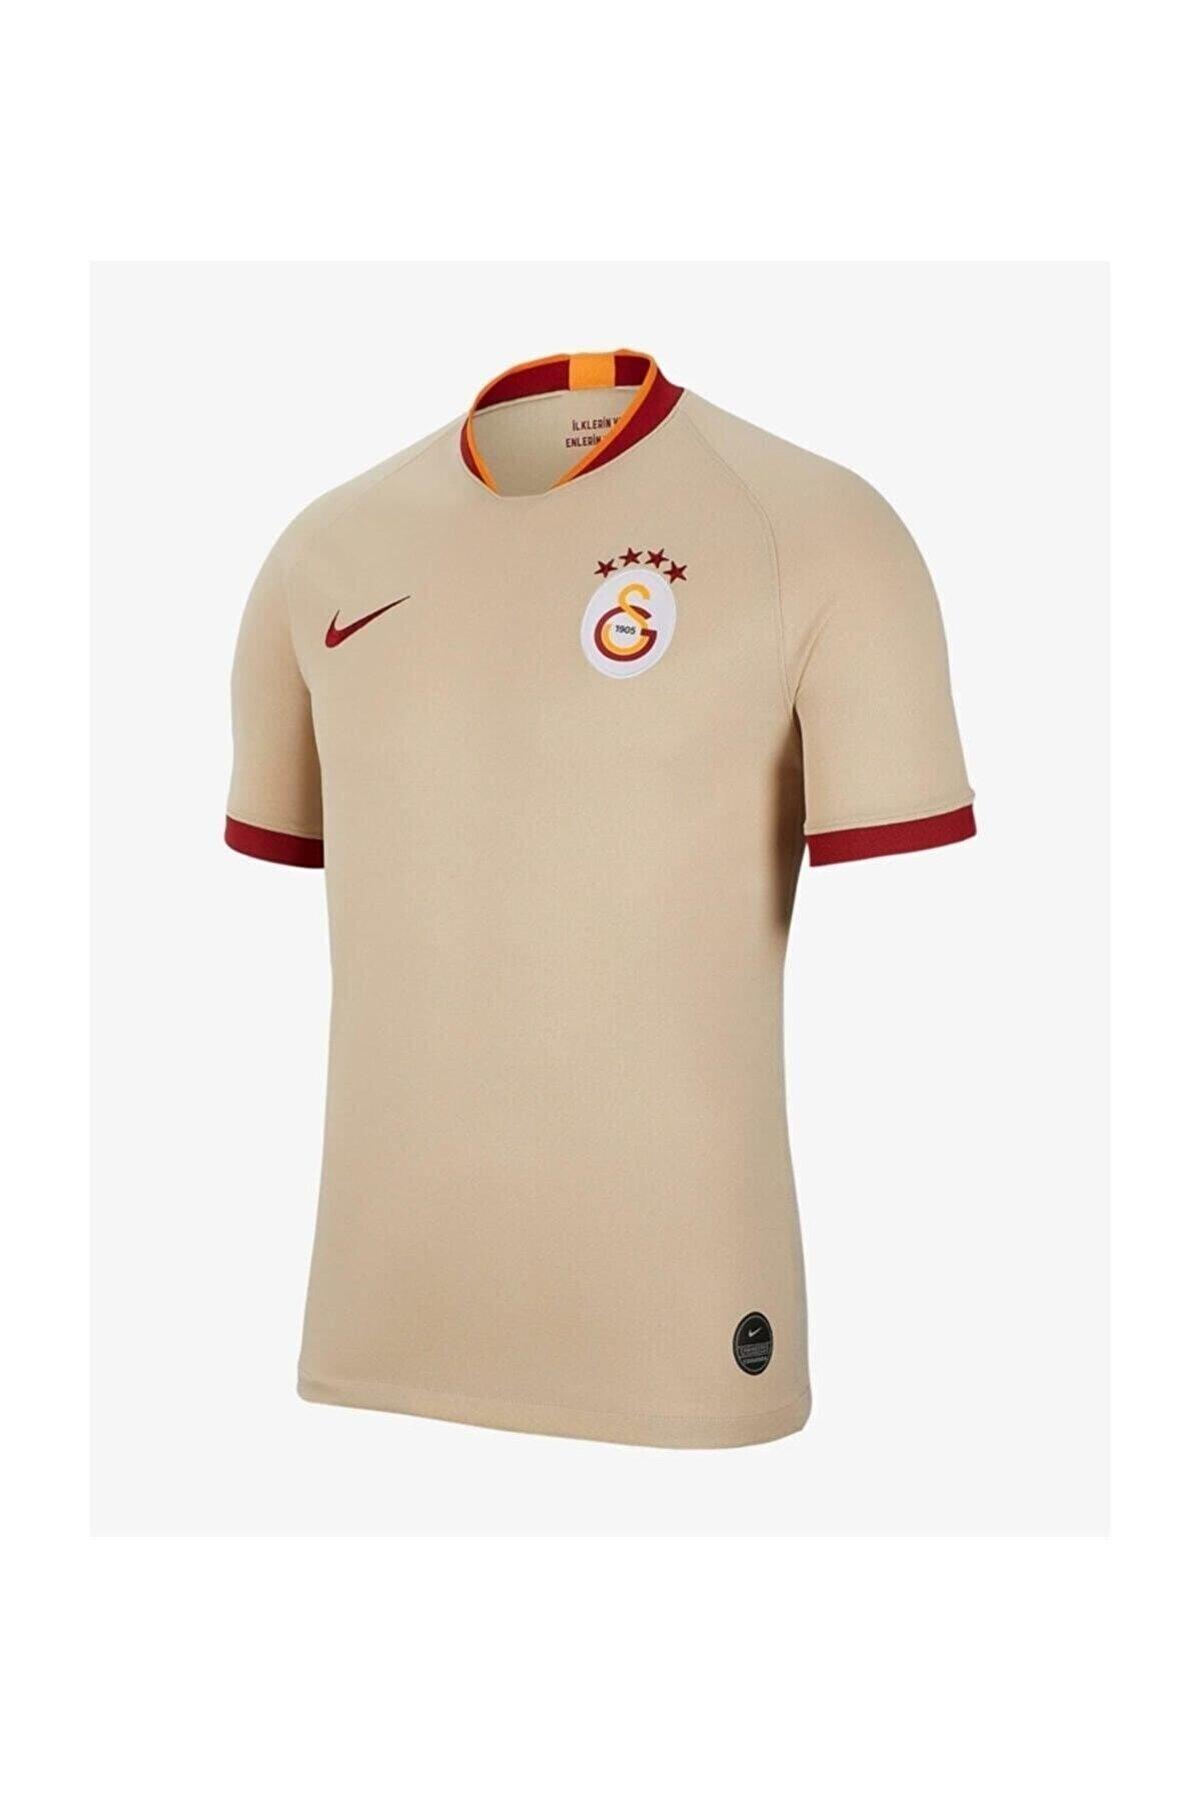 Nike Aj5536-248 Galatasaray 2019-20 Away Futbolcu Forması